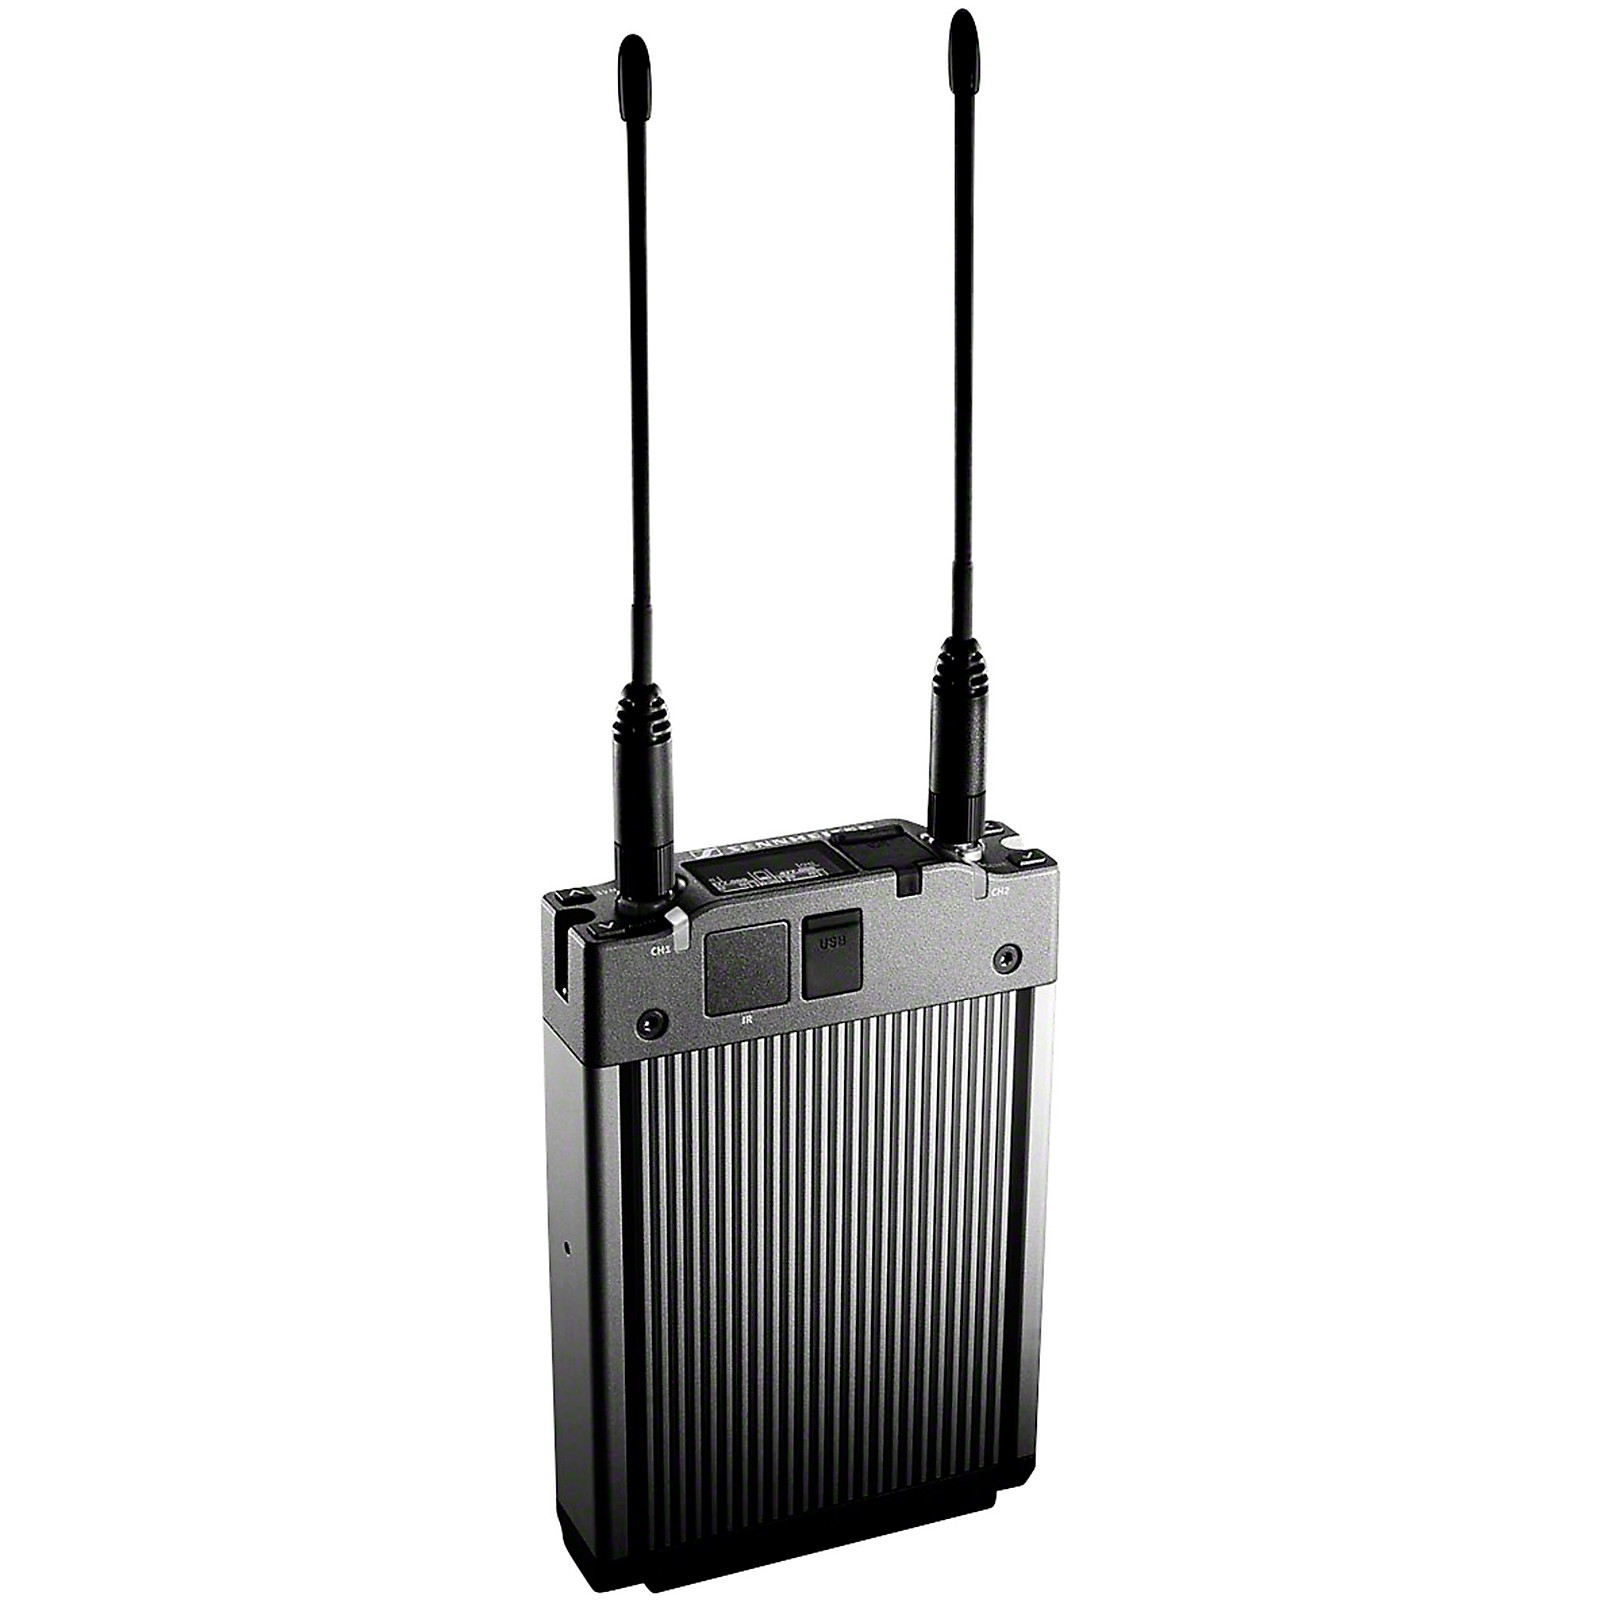 Sennheiser EK 6042 two-channel receiver microphone broadcast